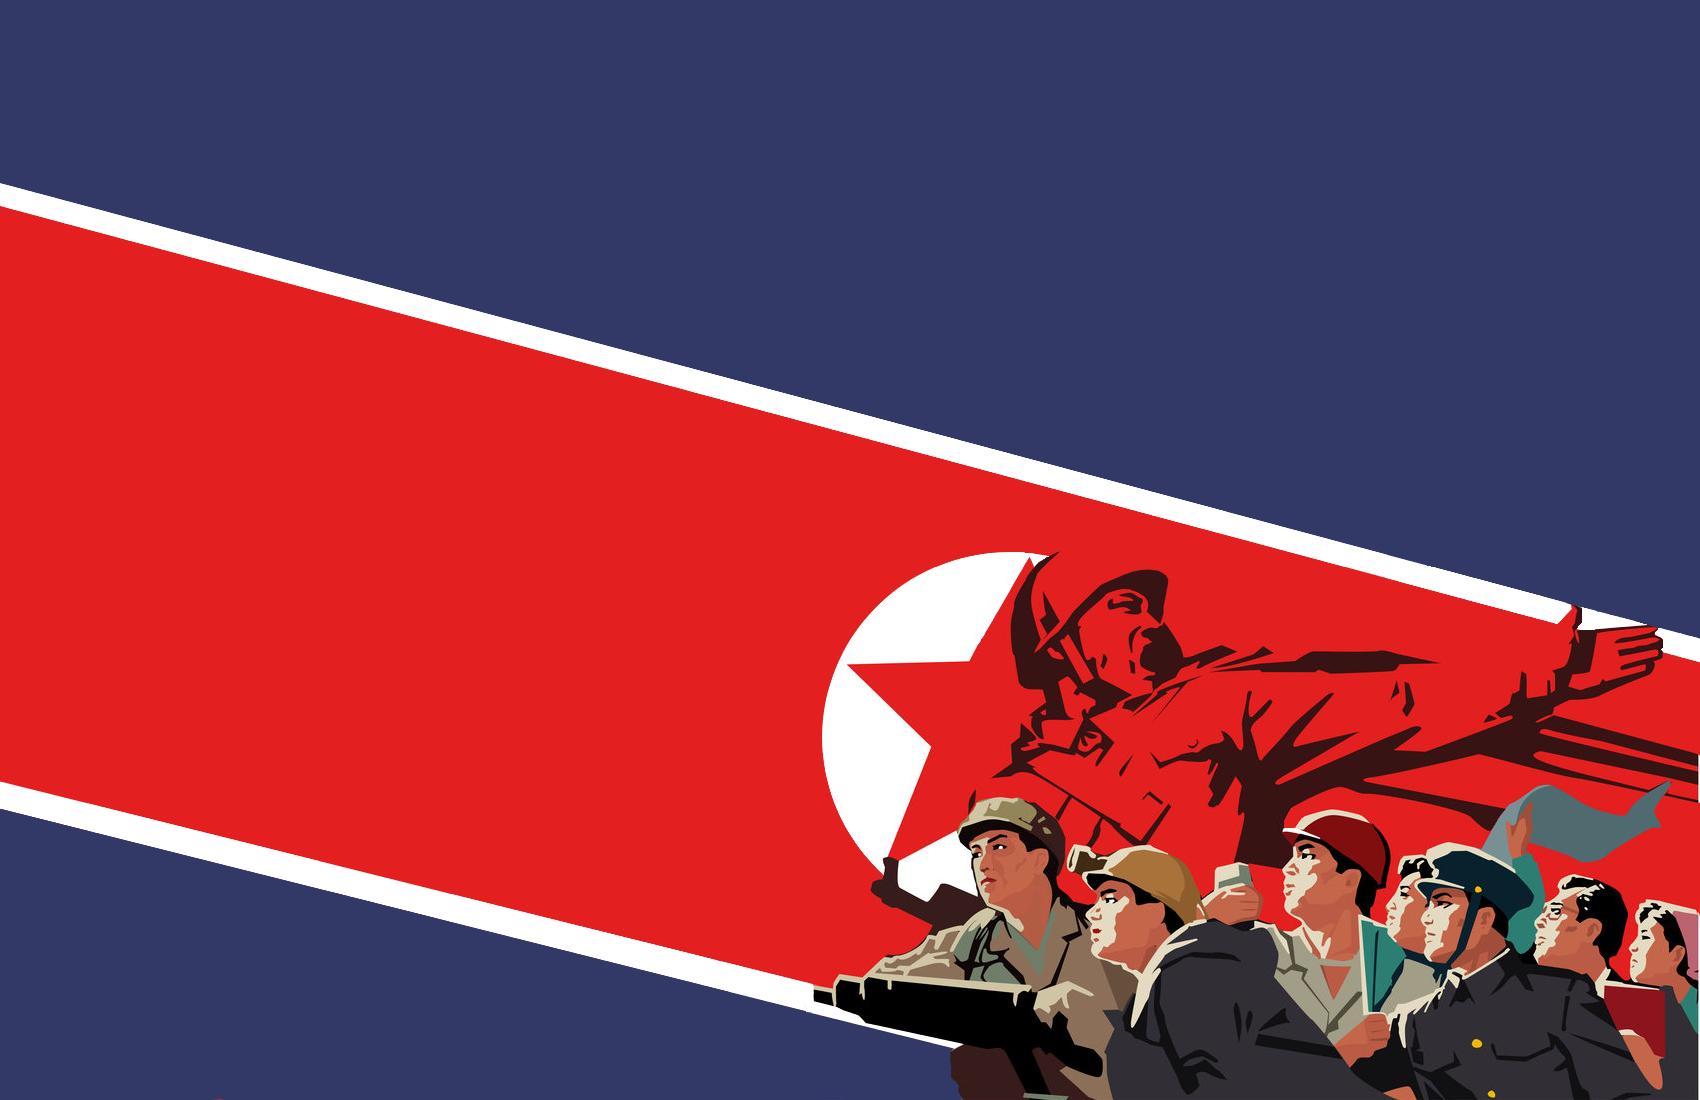 North Korean Wallpaper R Wallpapers North Korea Flag Korea Wallpaper North Korean